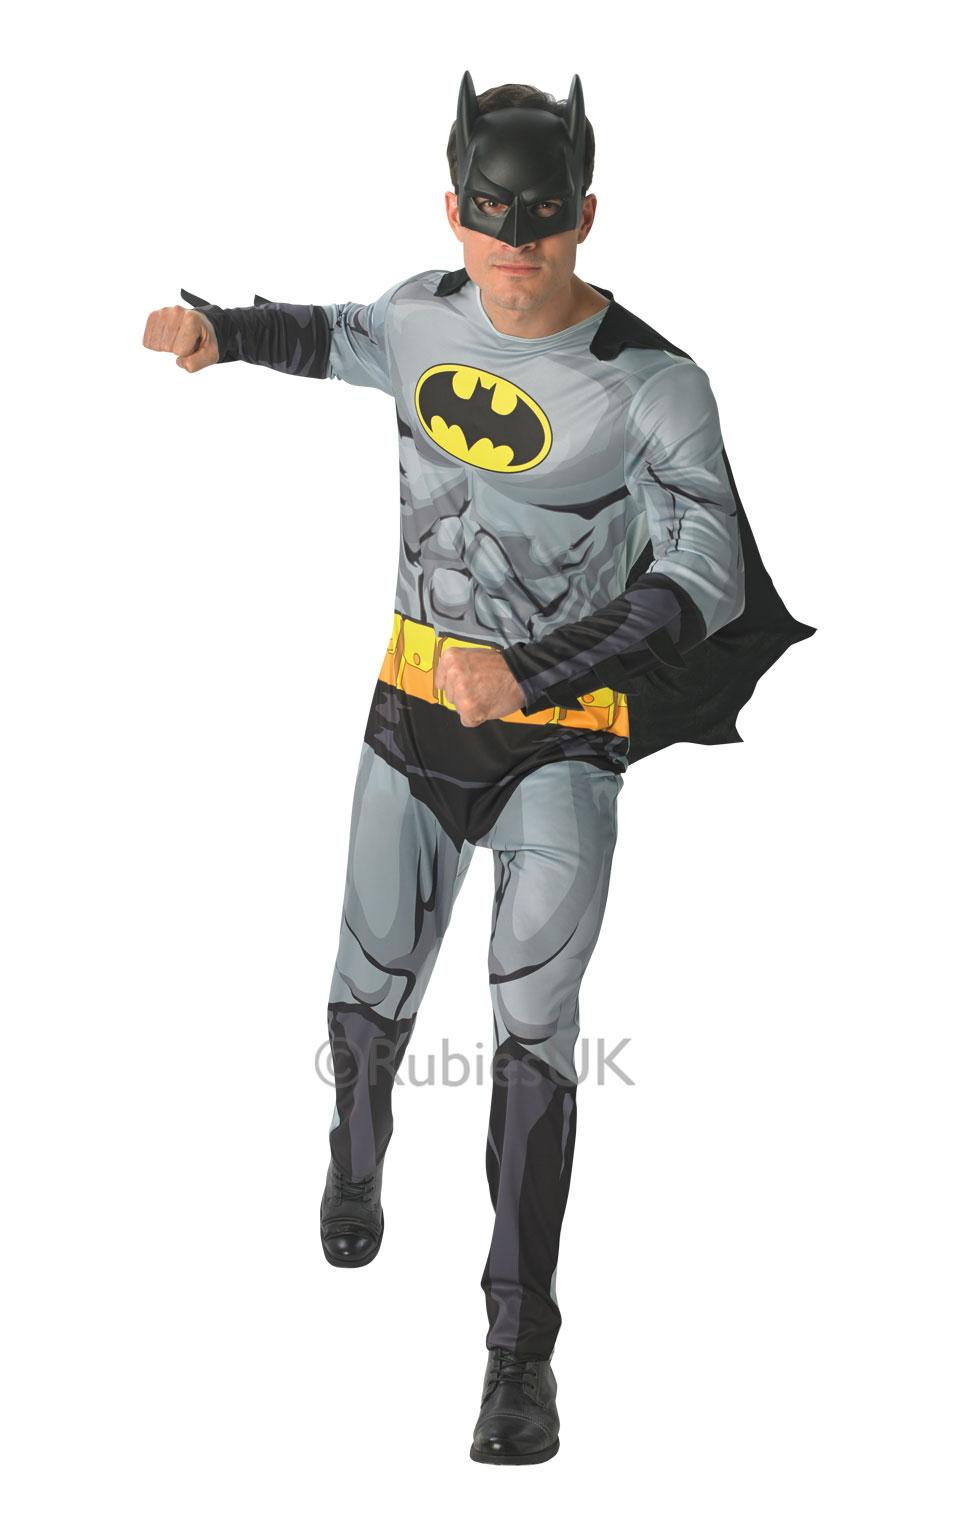 Mens Adult Batman Comic Book Fancy Dress Costume Outfit Rubies Official